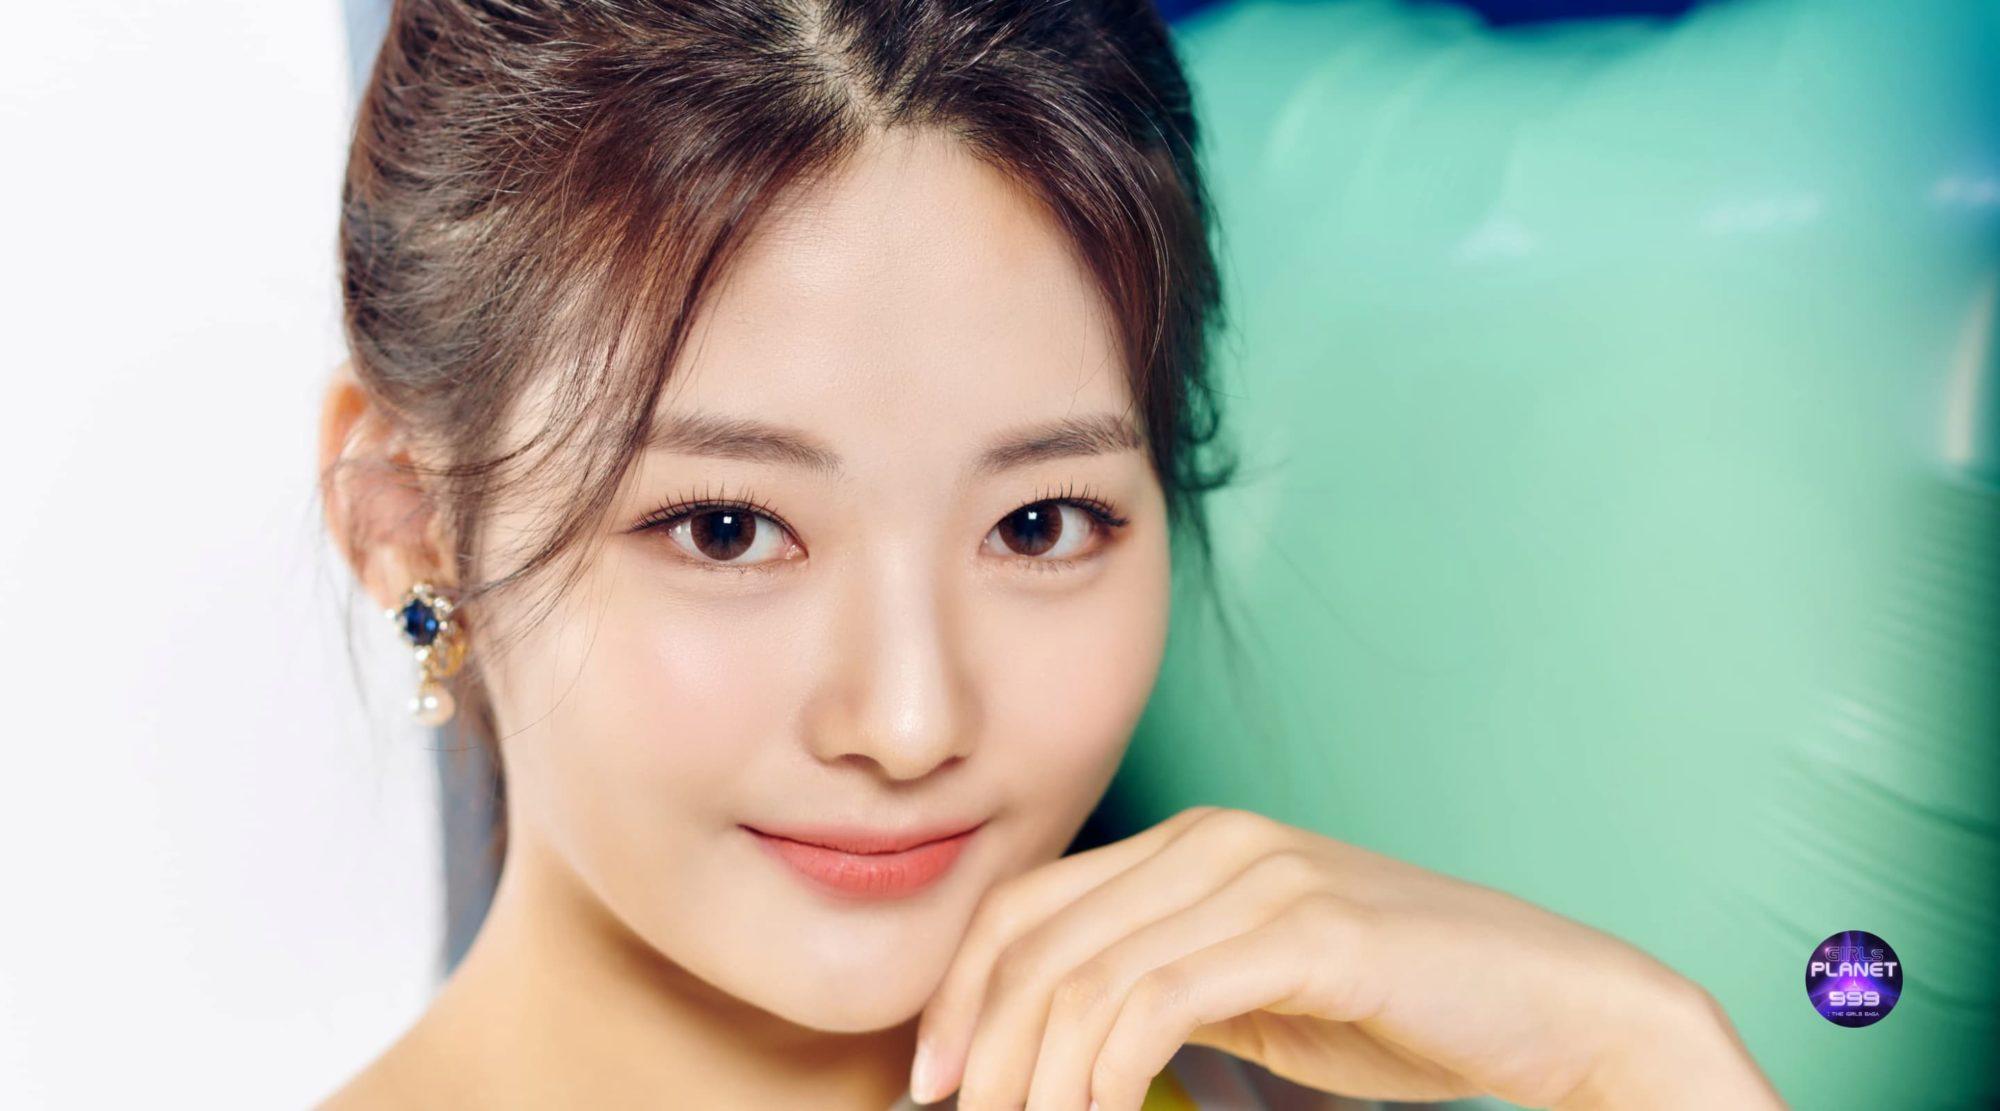 Choi Hyerin Girls Planet 999